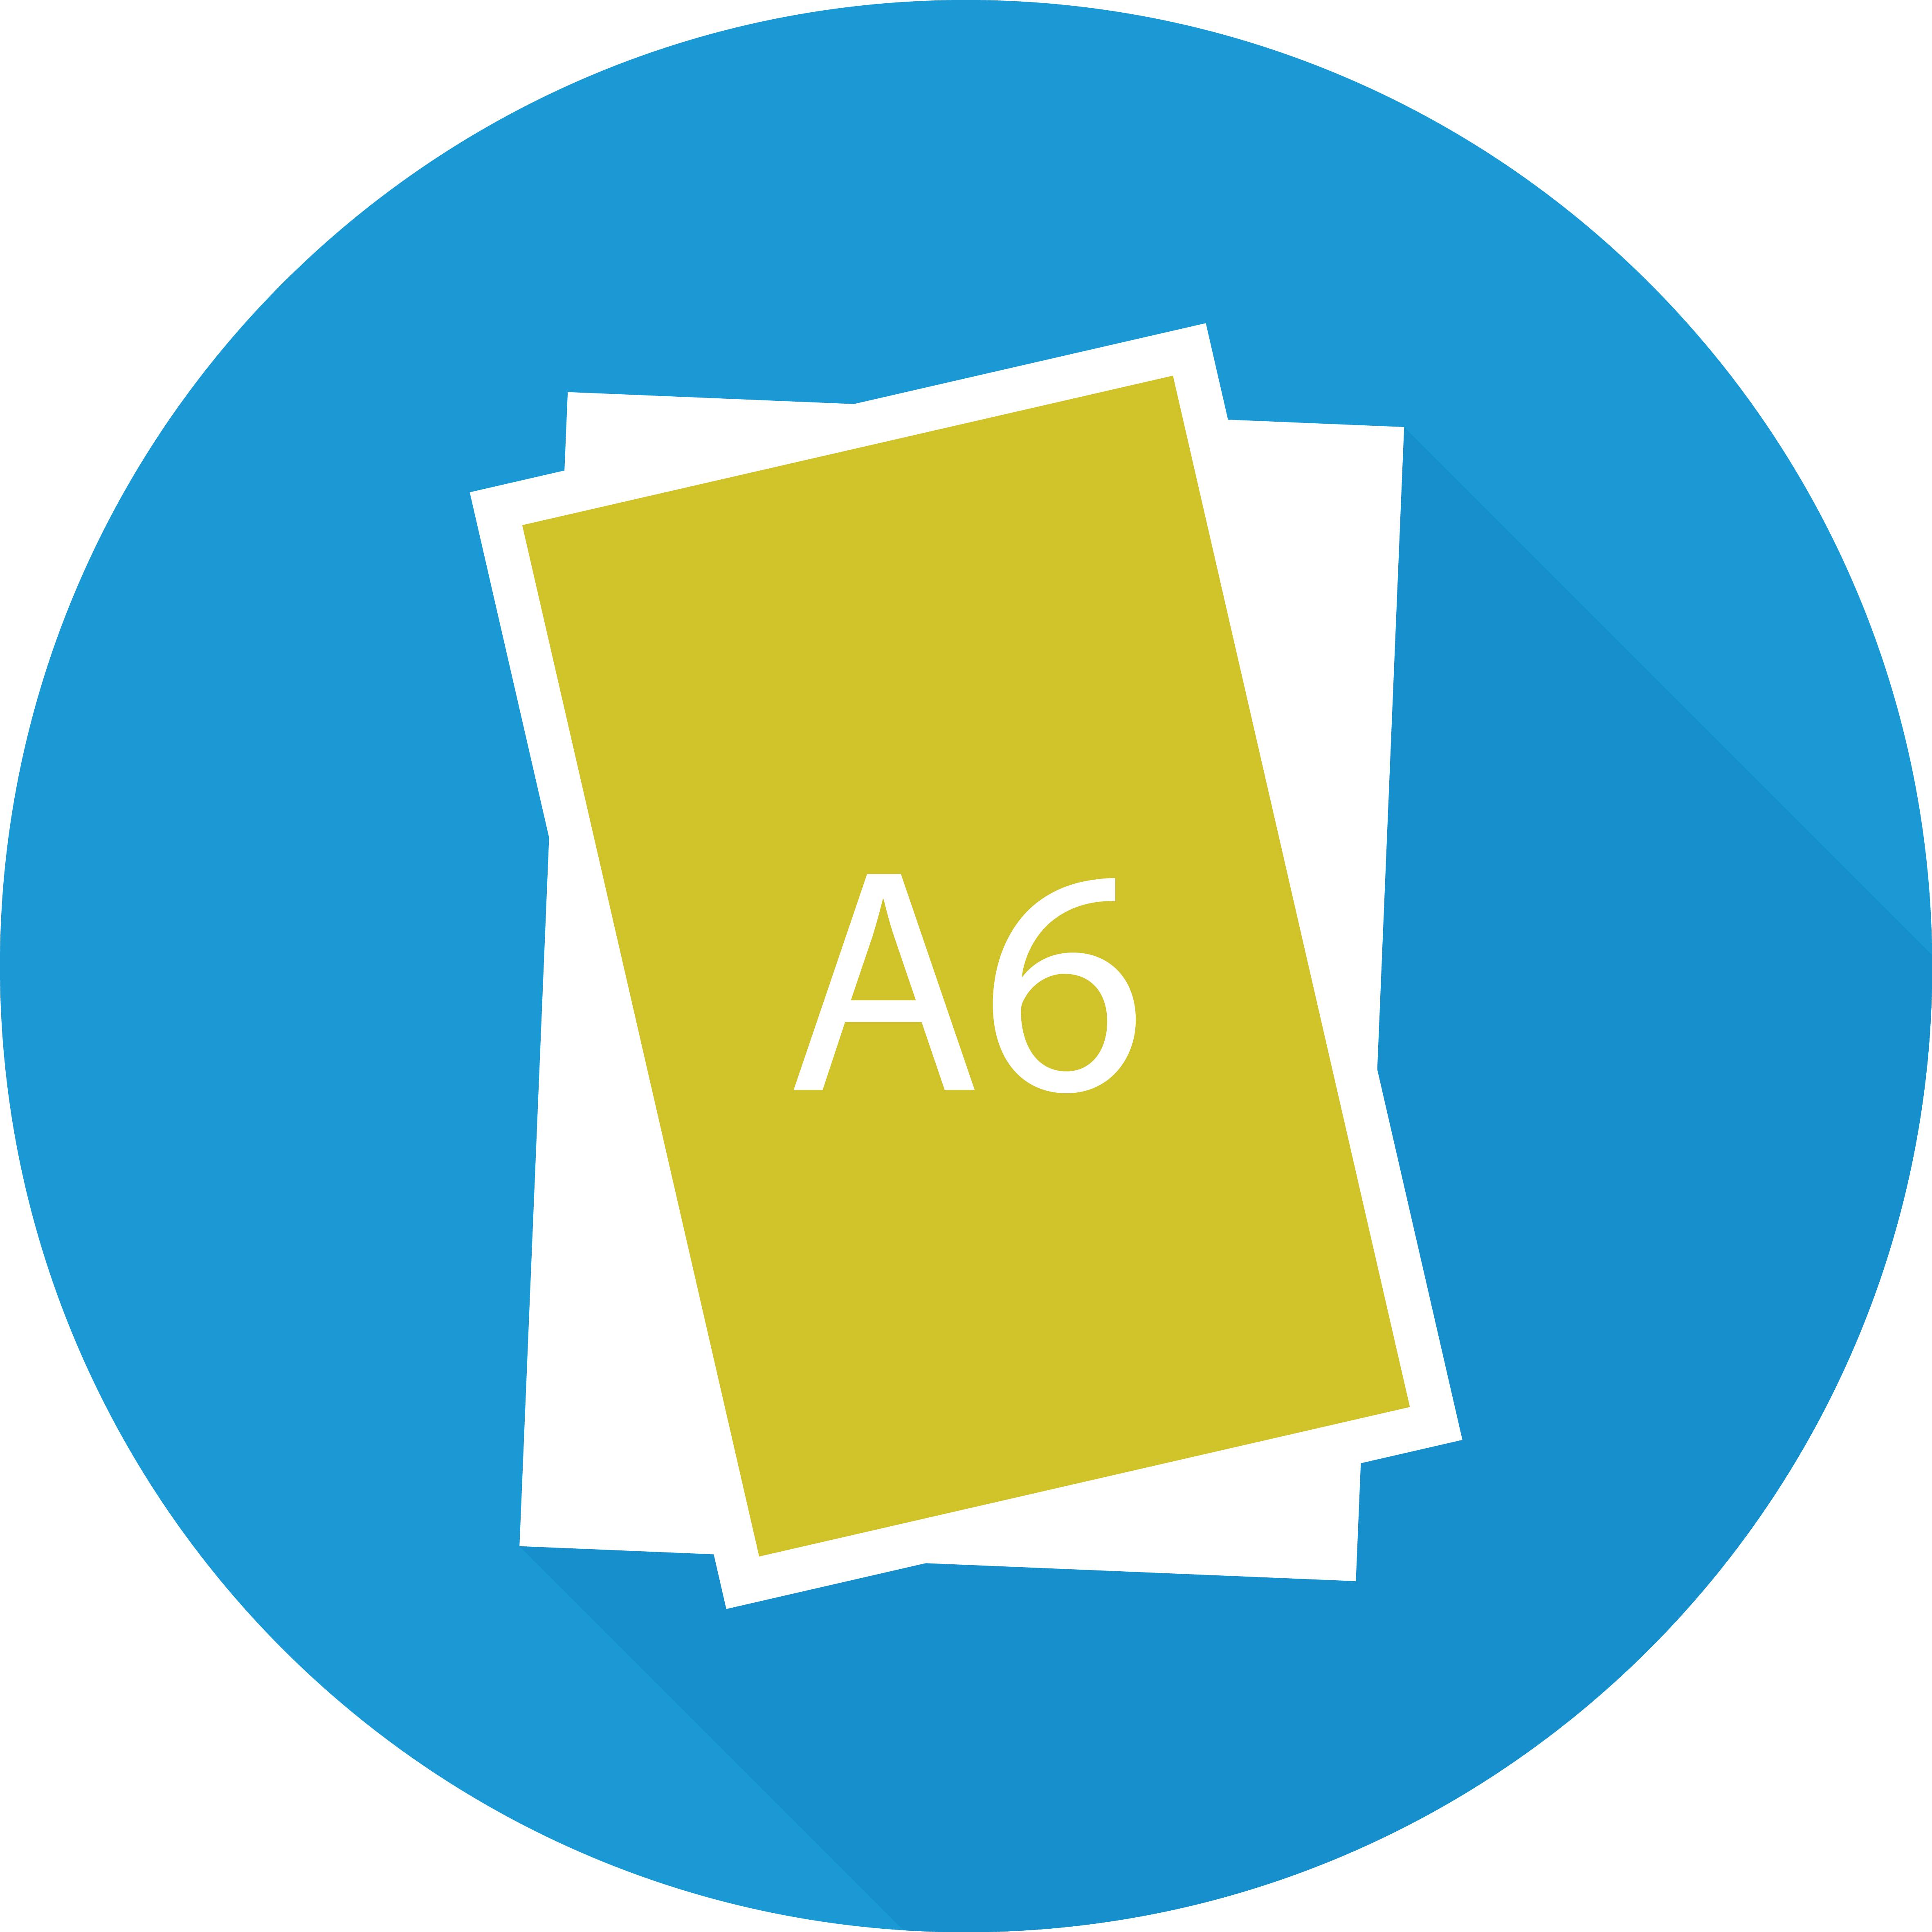 A6-01 (1)